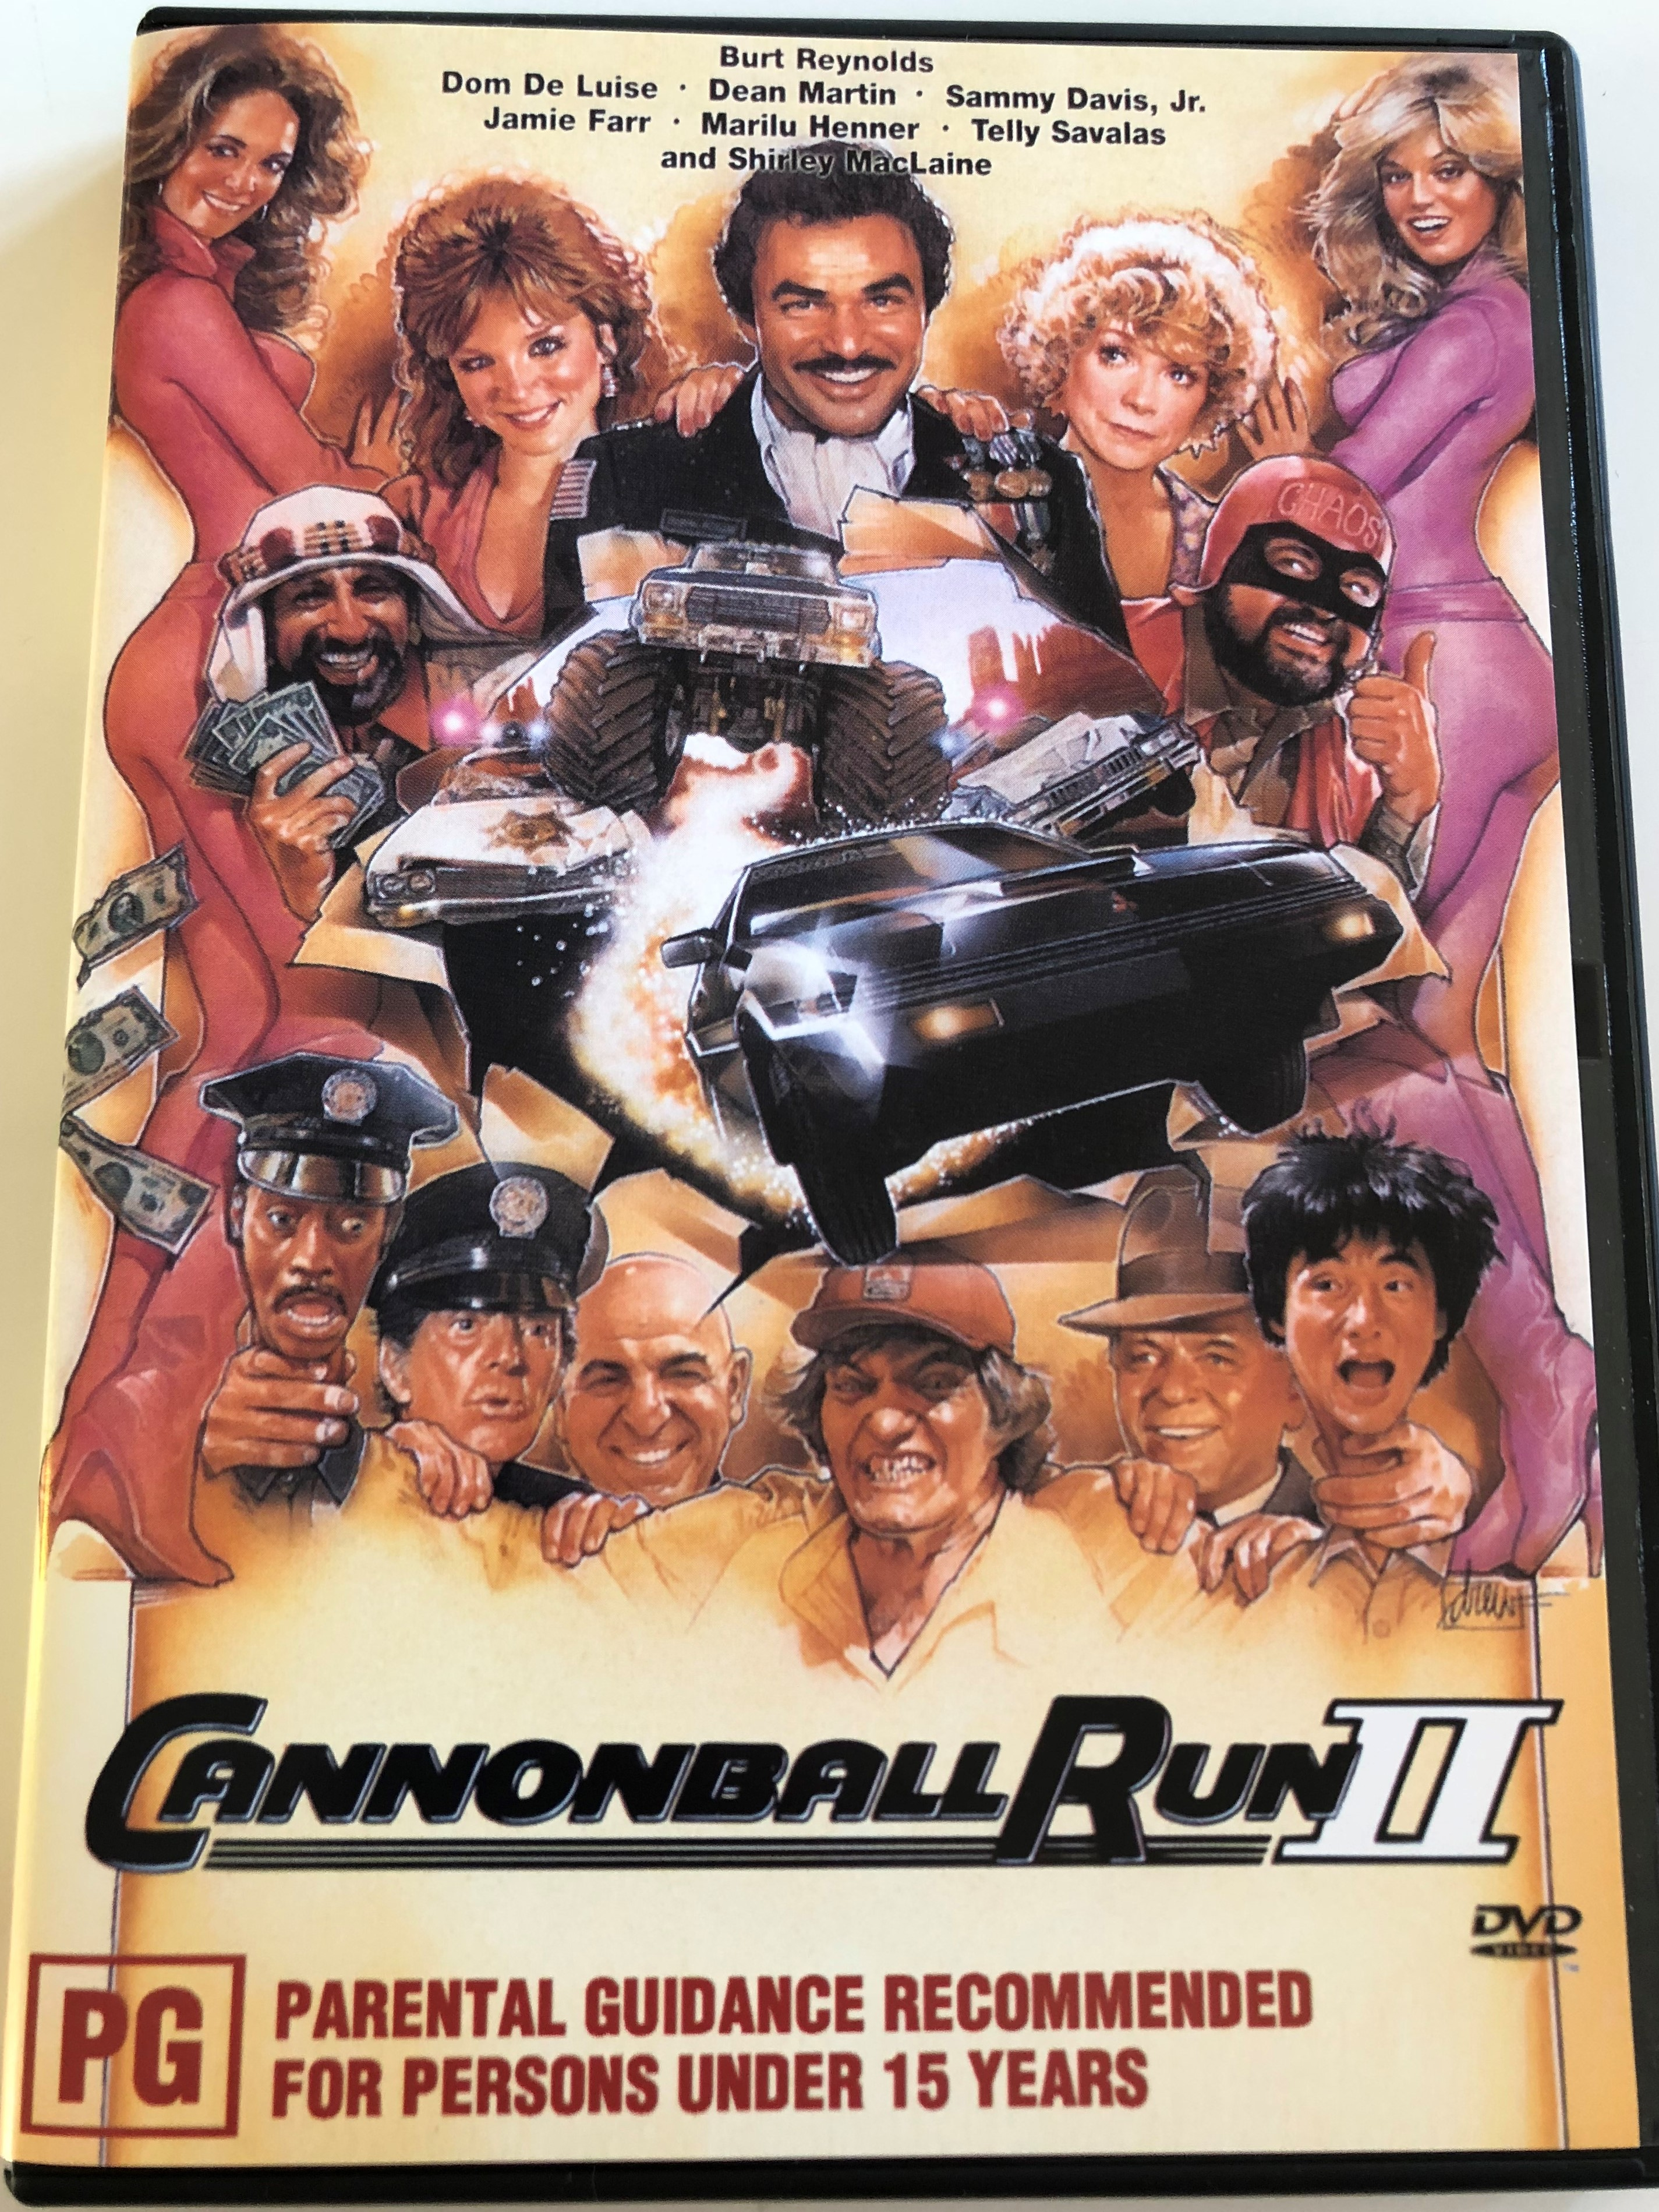 cannonball-run-ii-dvd-1984-directed-by-hal-needham-1.jpg